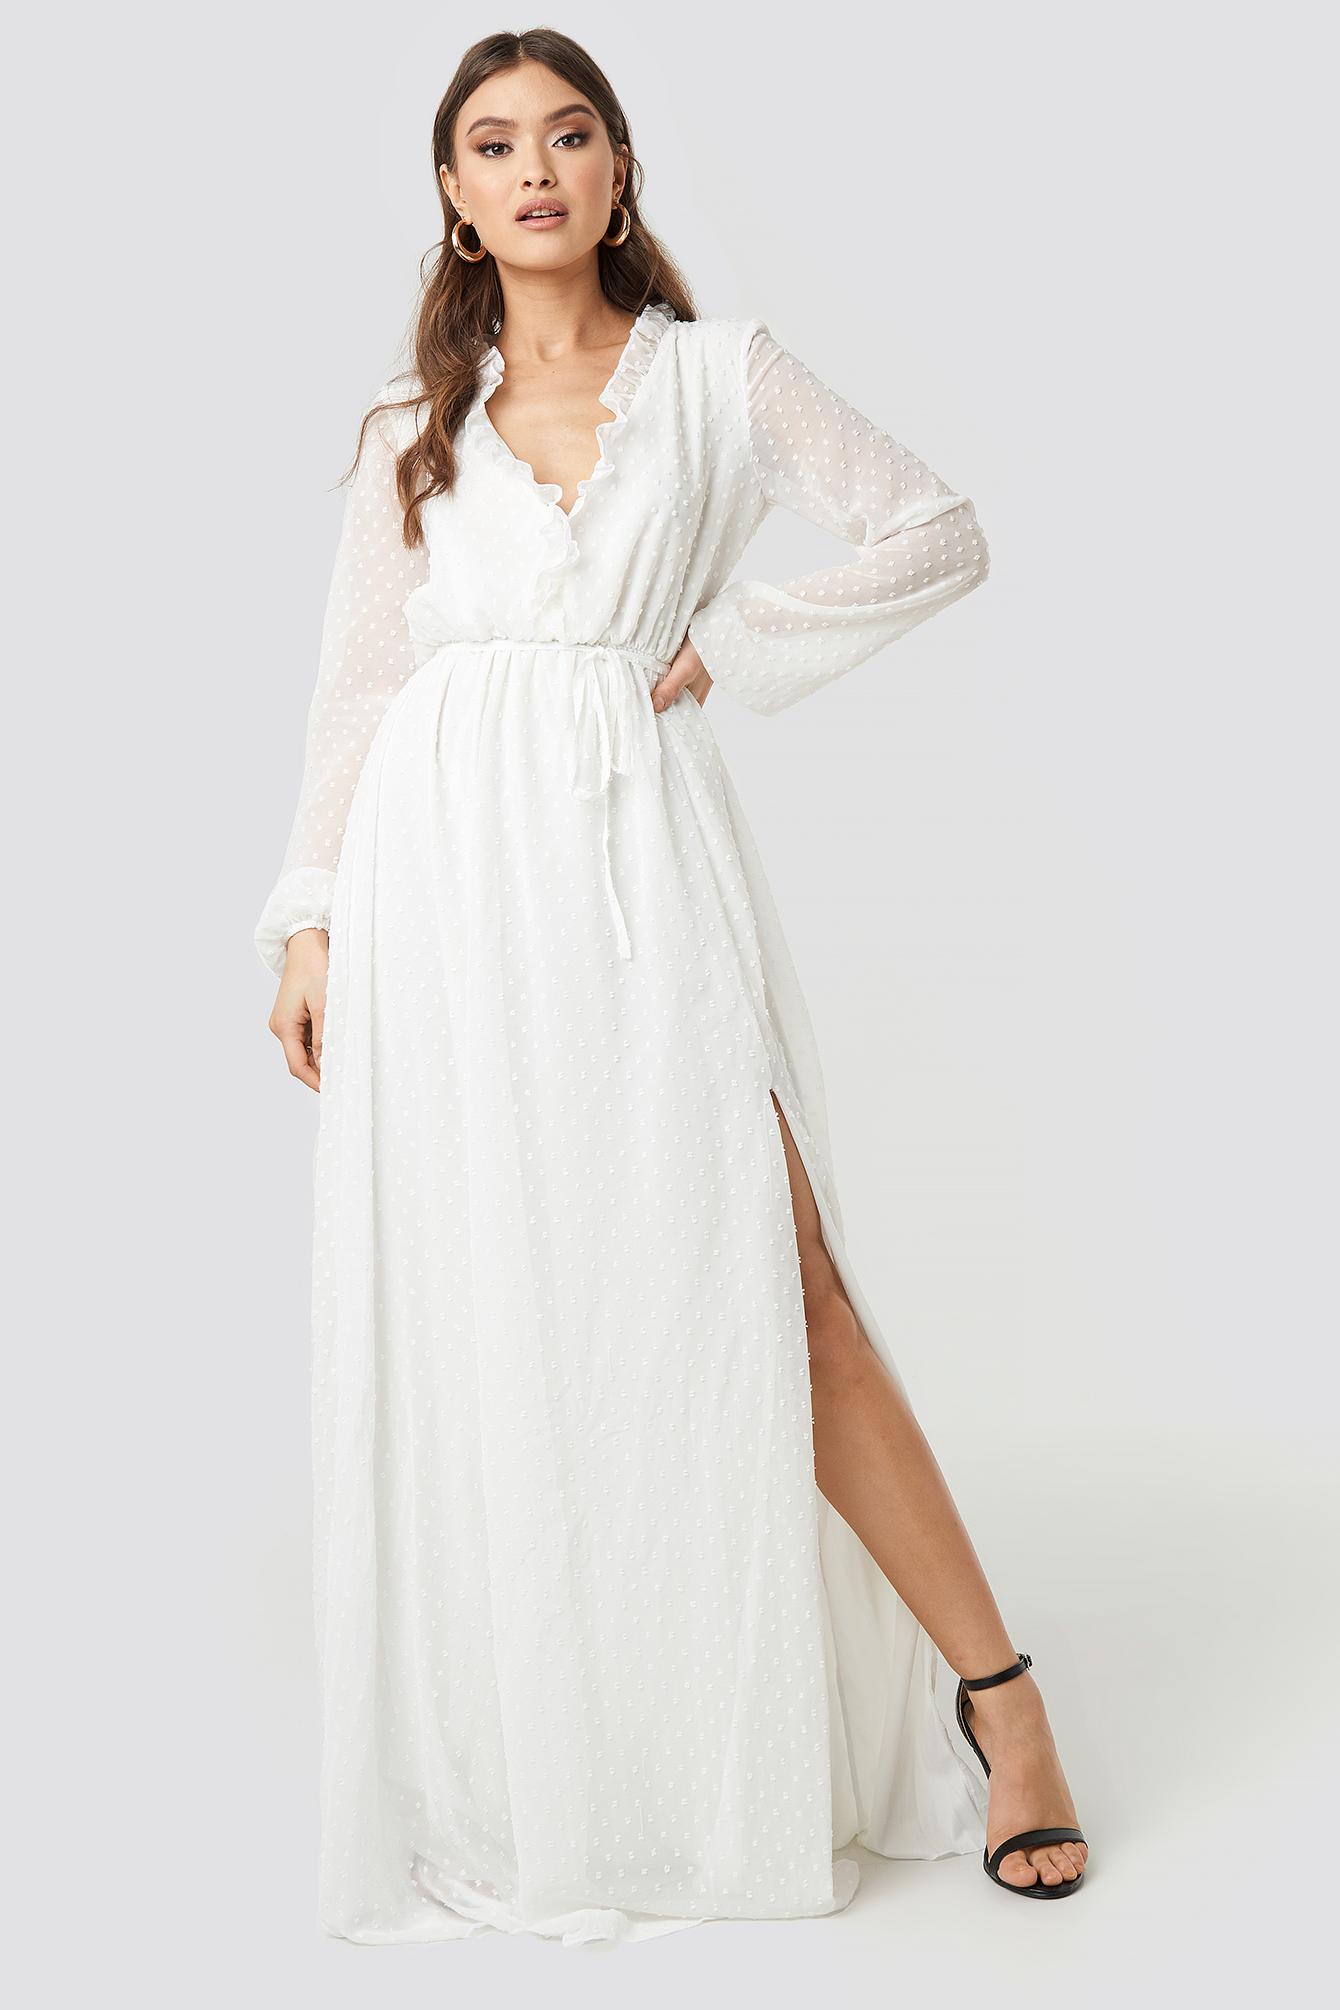 e6cc44c635b35 Trendyol Tulum Ruffle Detailed Evening Dress - White | ModeSens